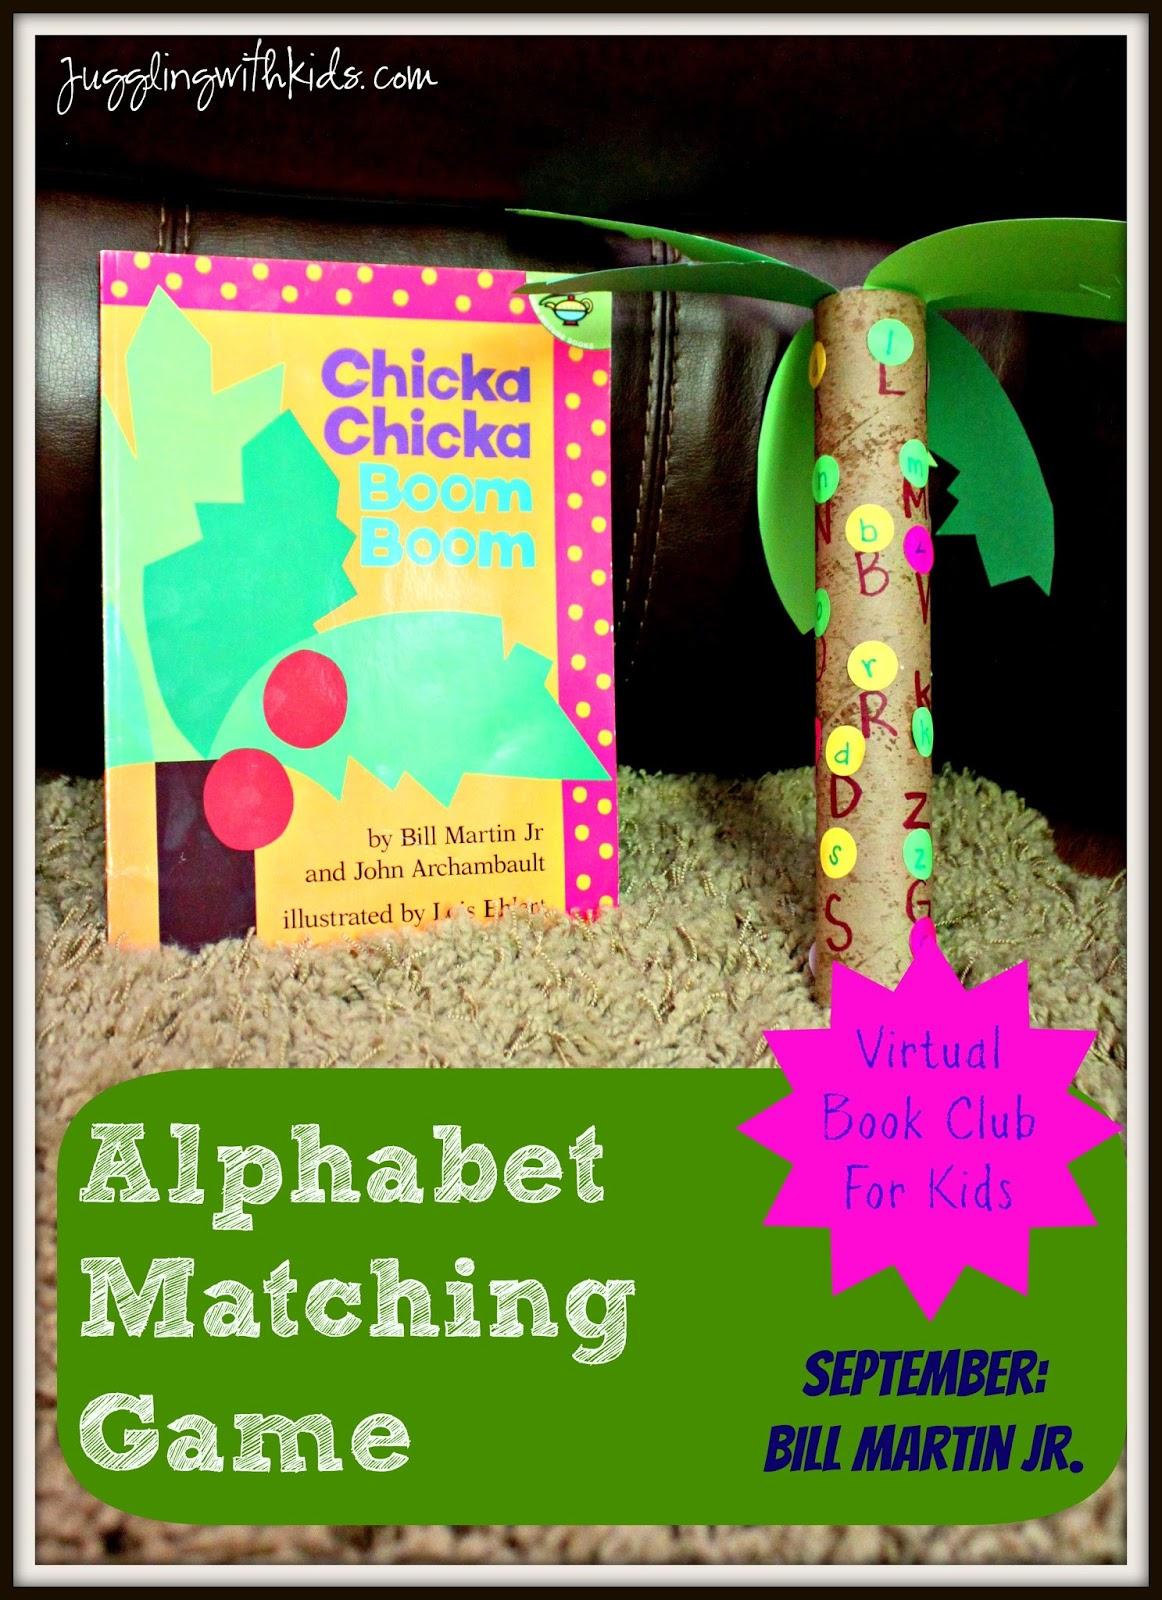 Chika Chika Boom Boom Alphabet Matching Game: Virtual Book Club for ...